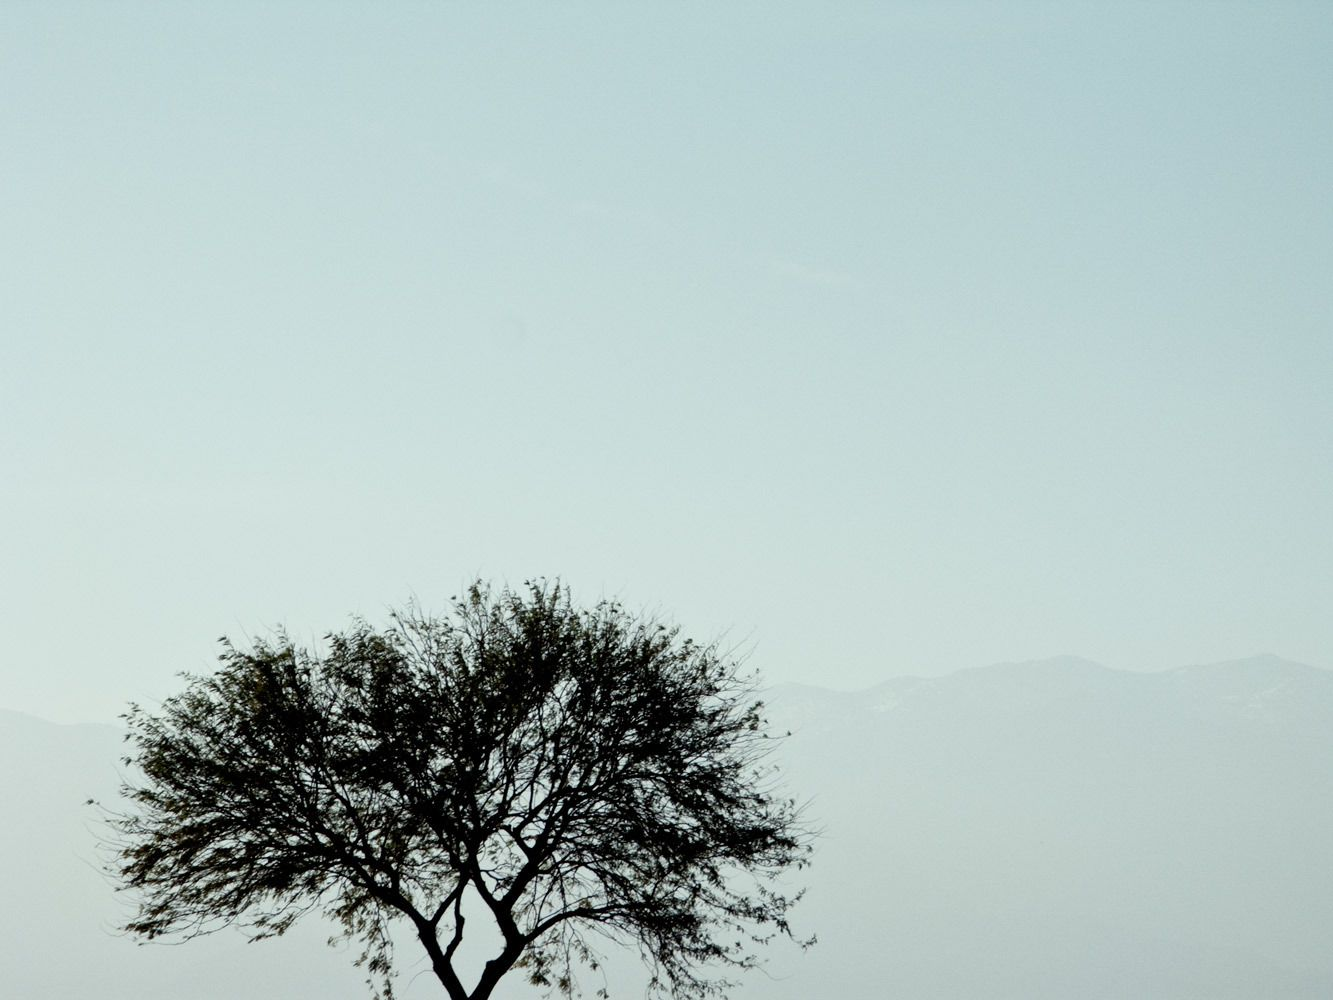 Professional Landscape Photography